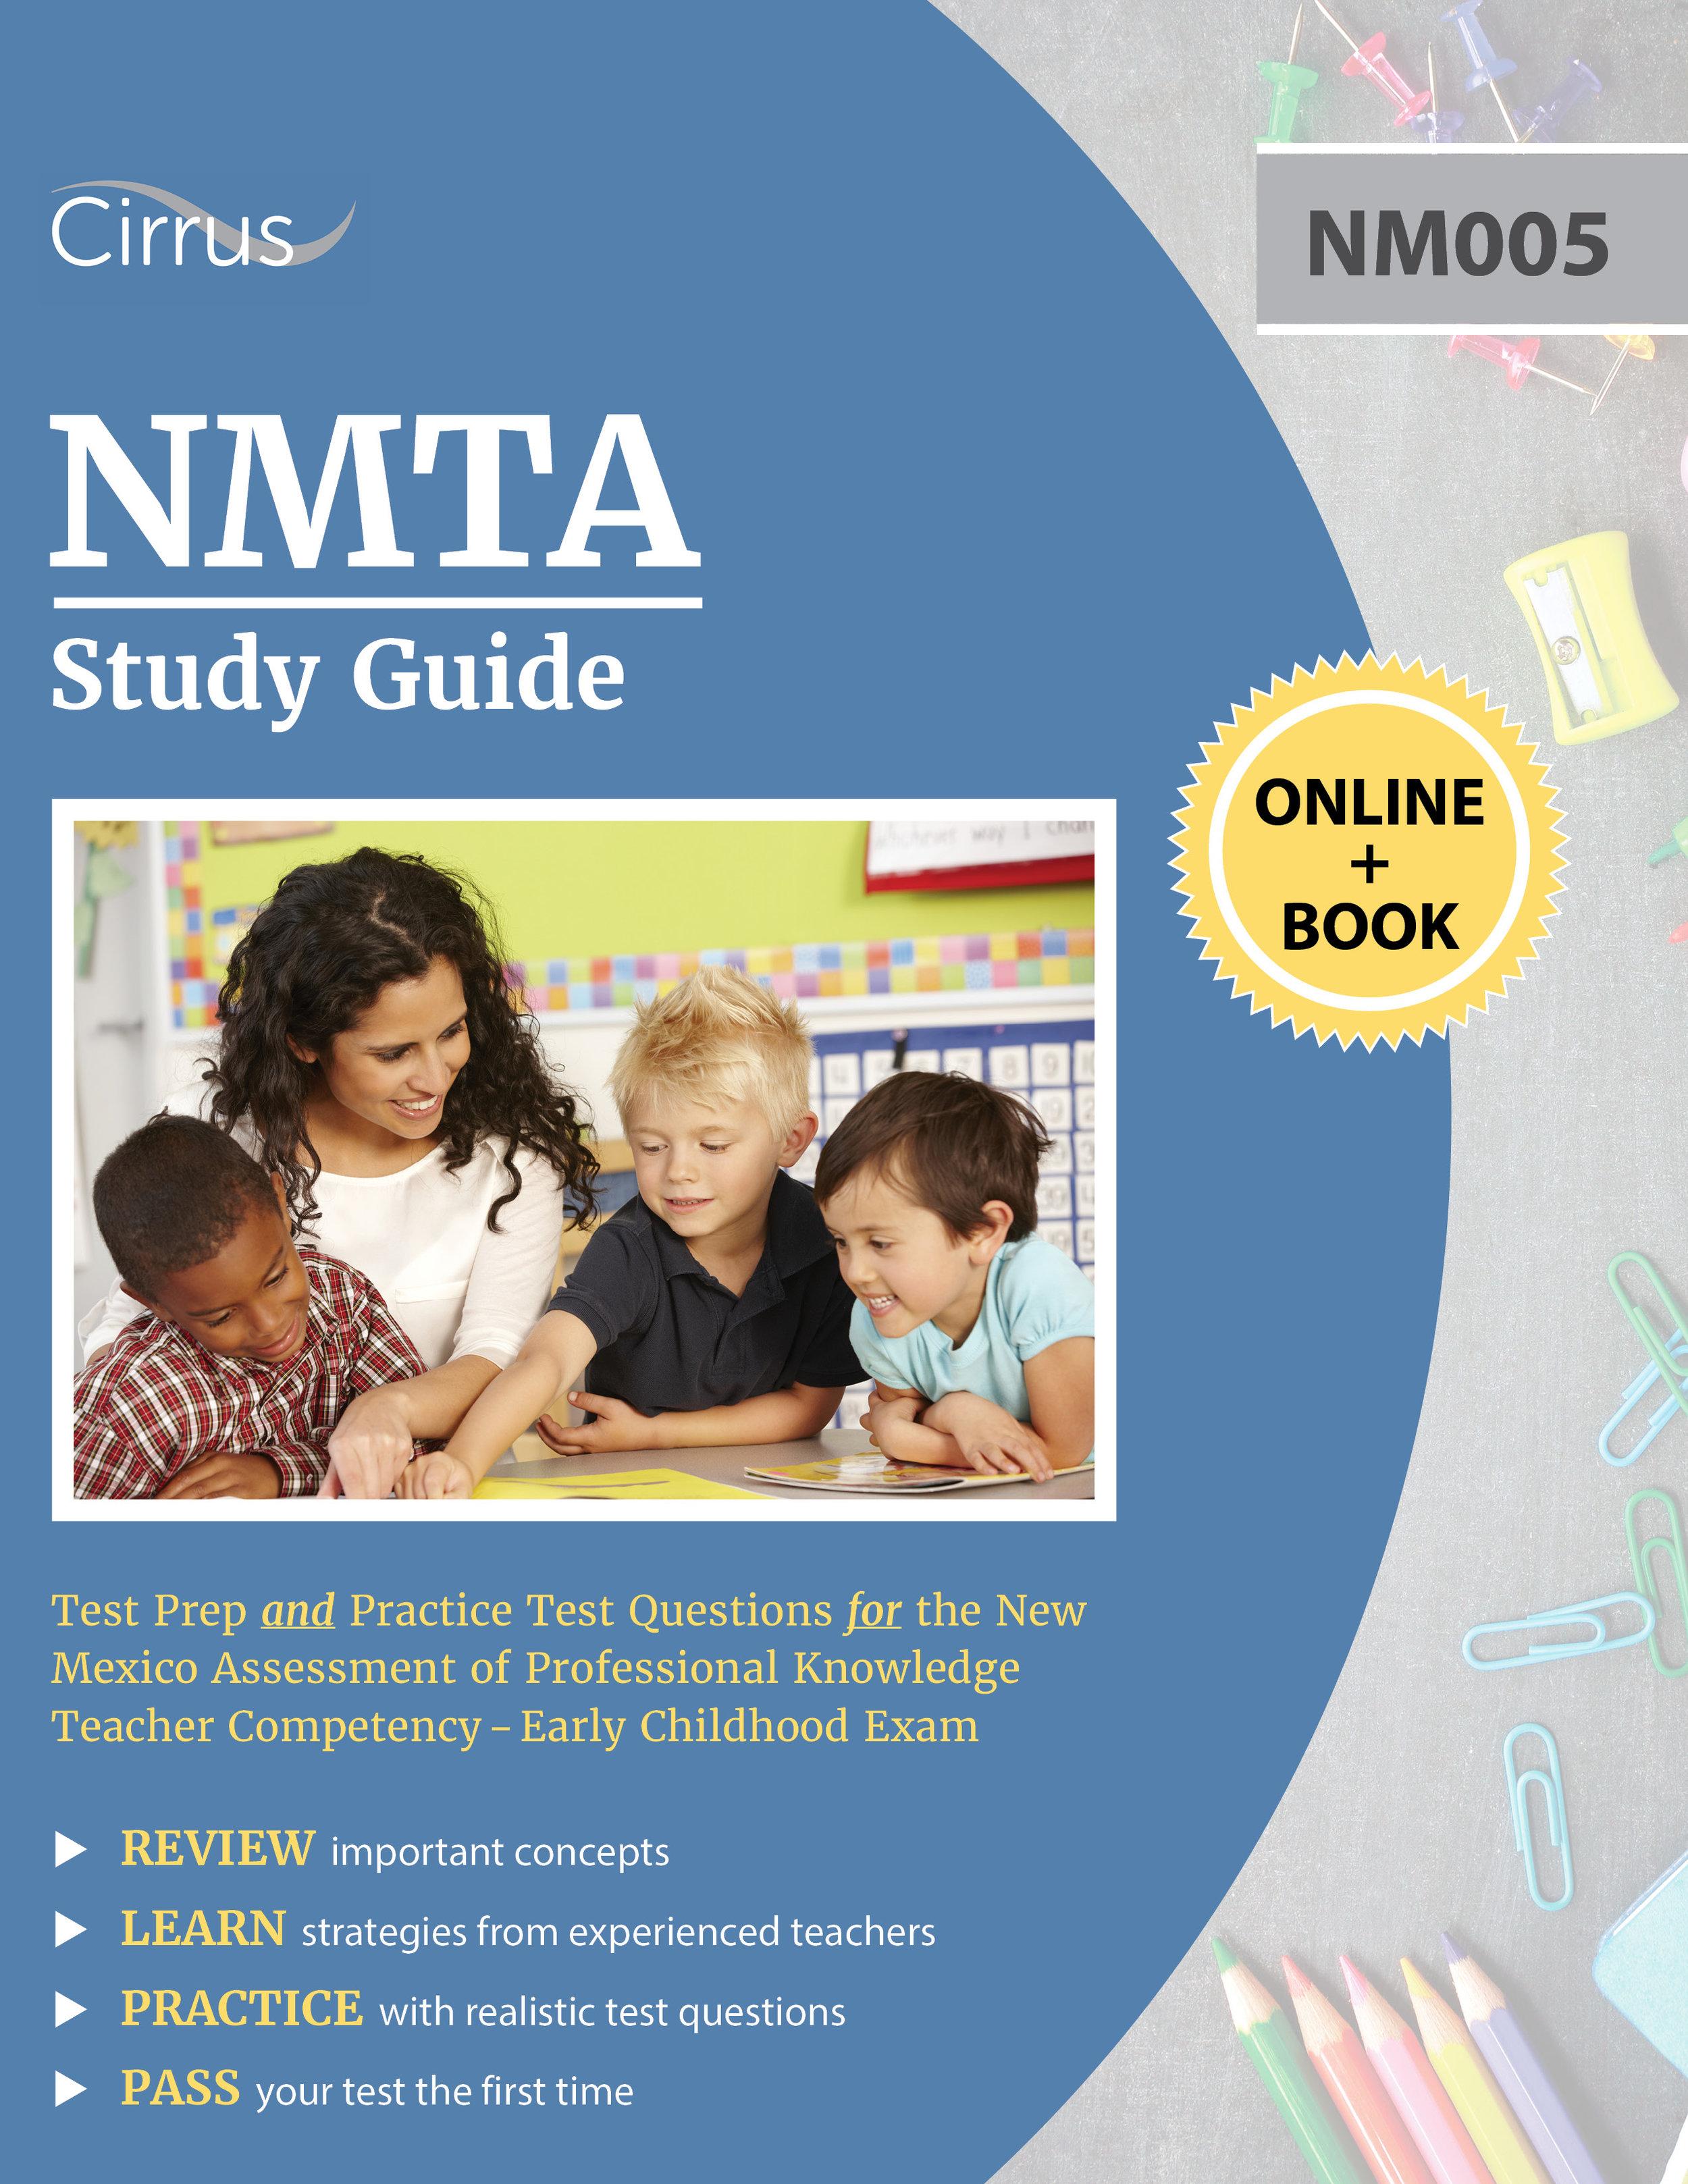 NMTA NM005